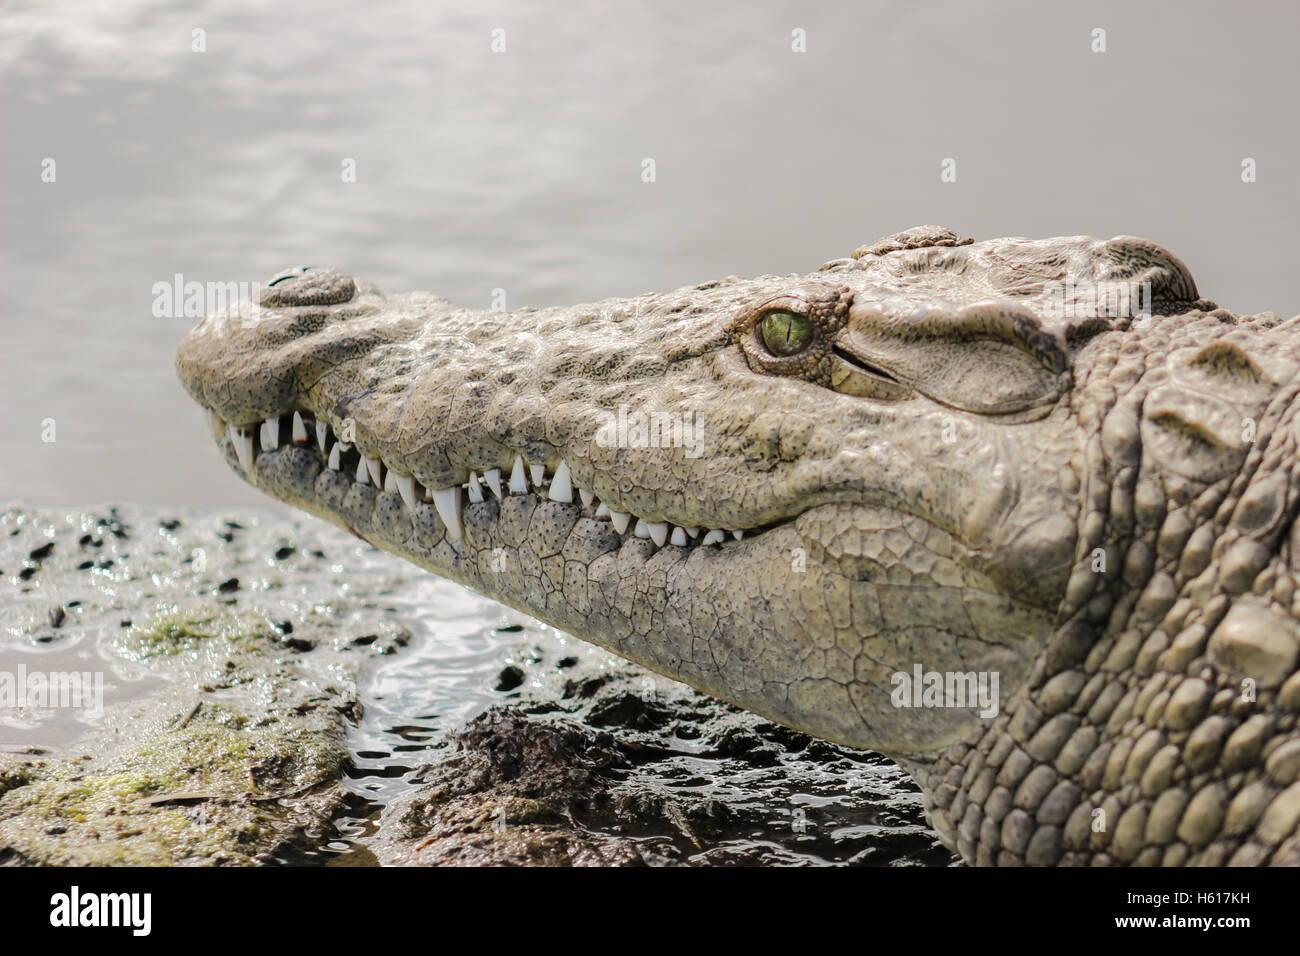 Nile crocodile closeup portrait in Kruger Natioanal park - Stock Photo